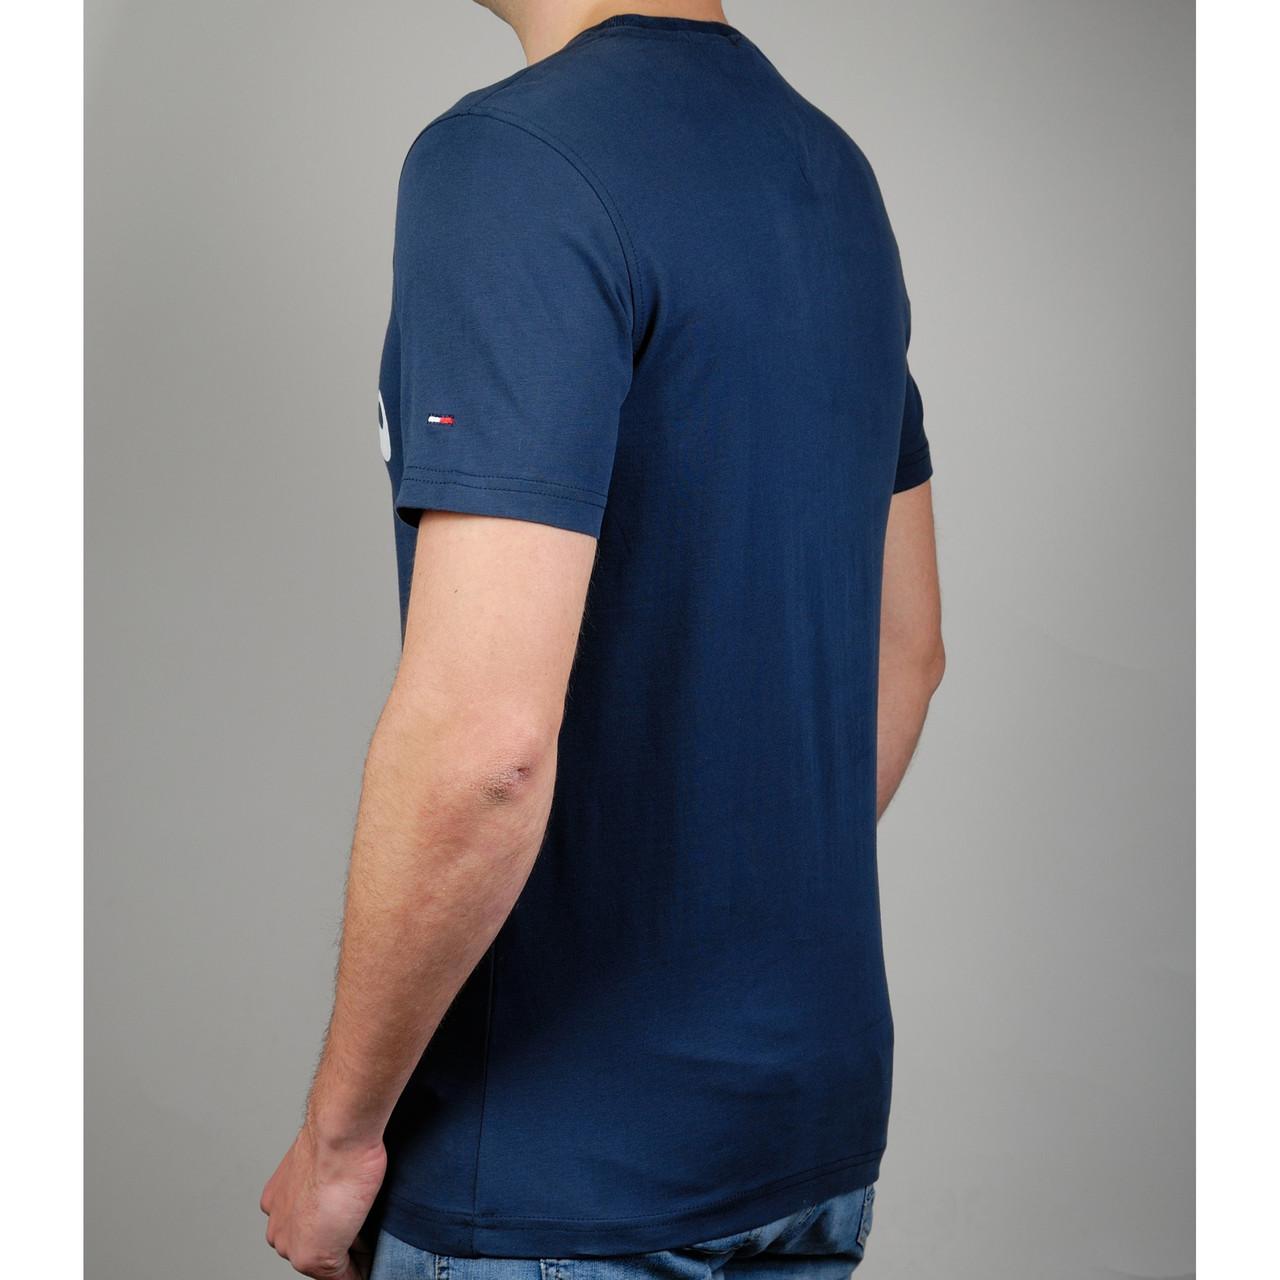 e1ba7f10ca979 Мужская футболка TOMMY HILFIGER 20827 темно-синяя - купить по лучшей ...